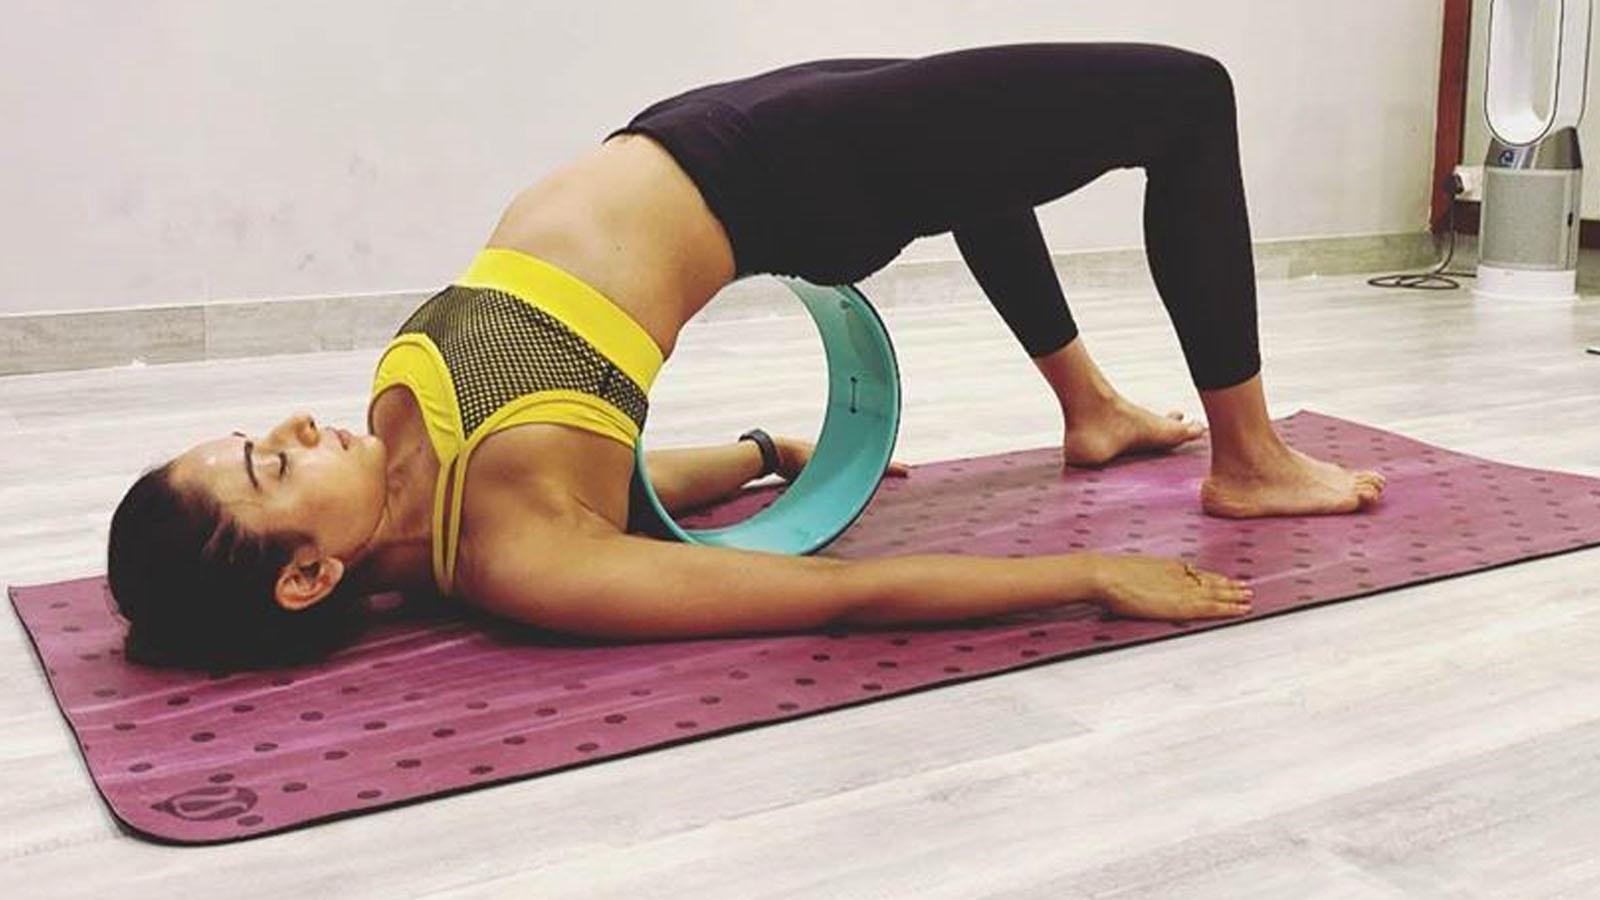 rakul-preet-singh-flaunts-her-envious-figure-as-she-performs-yoga